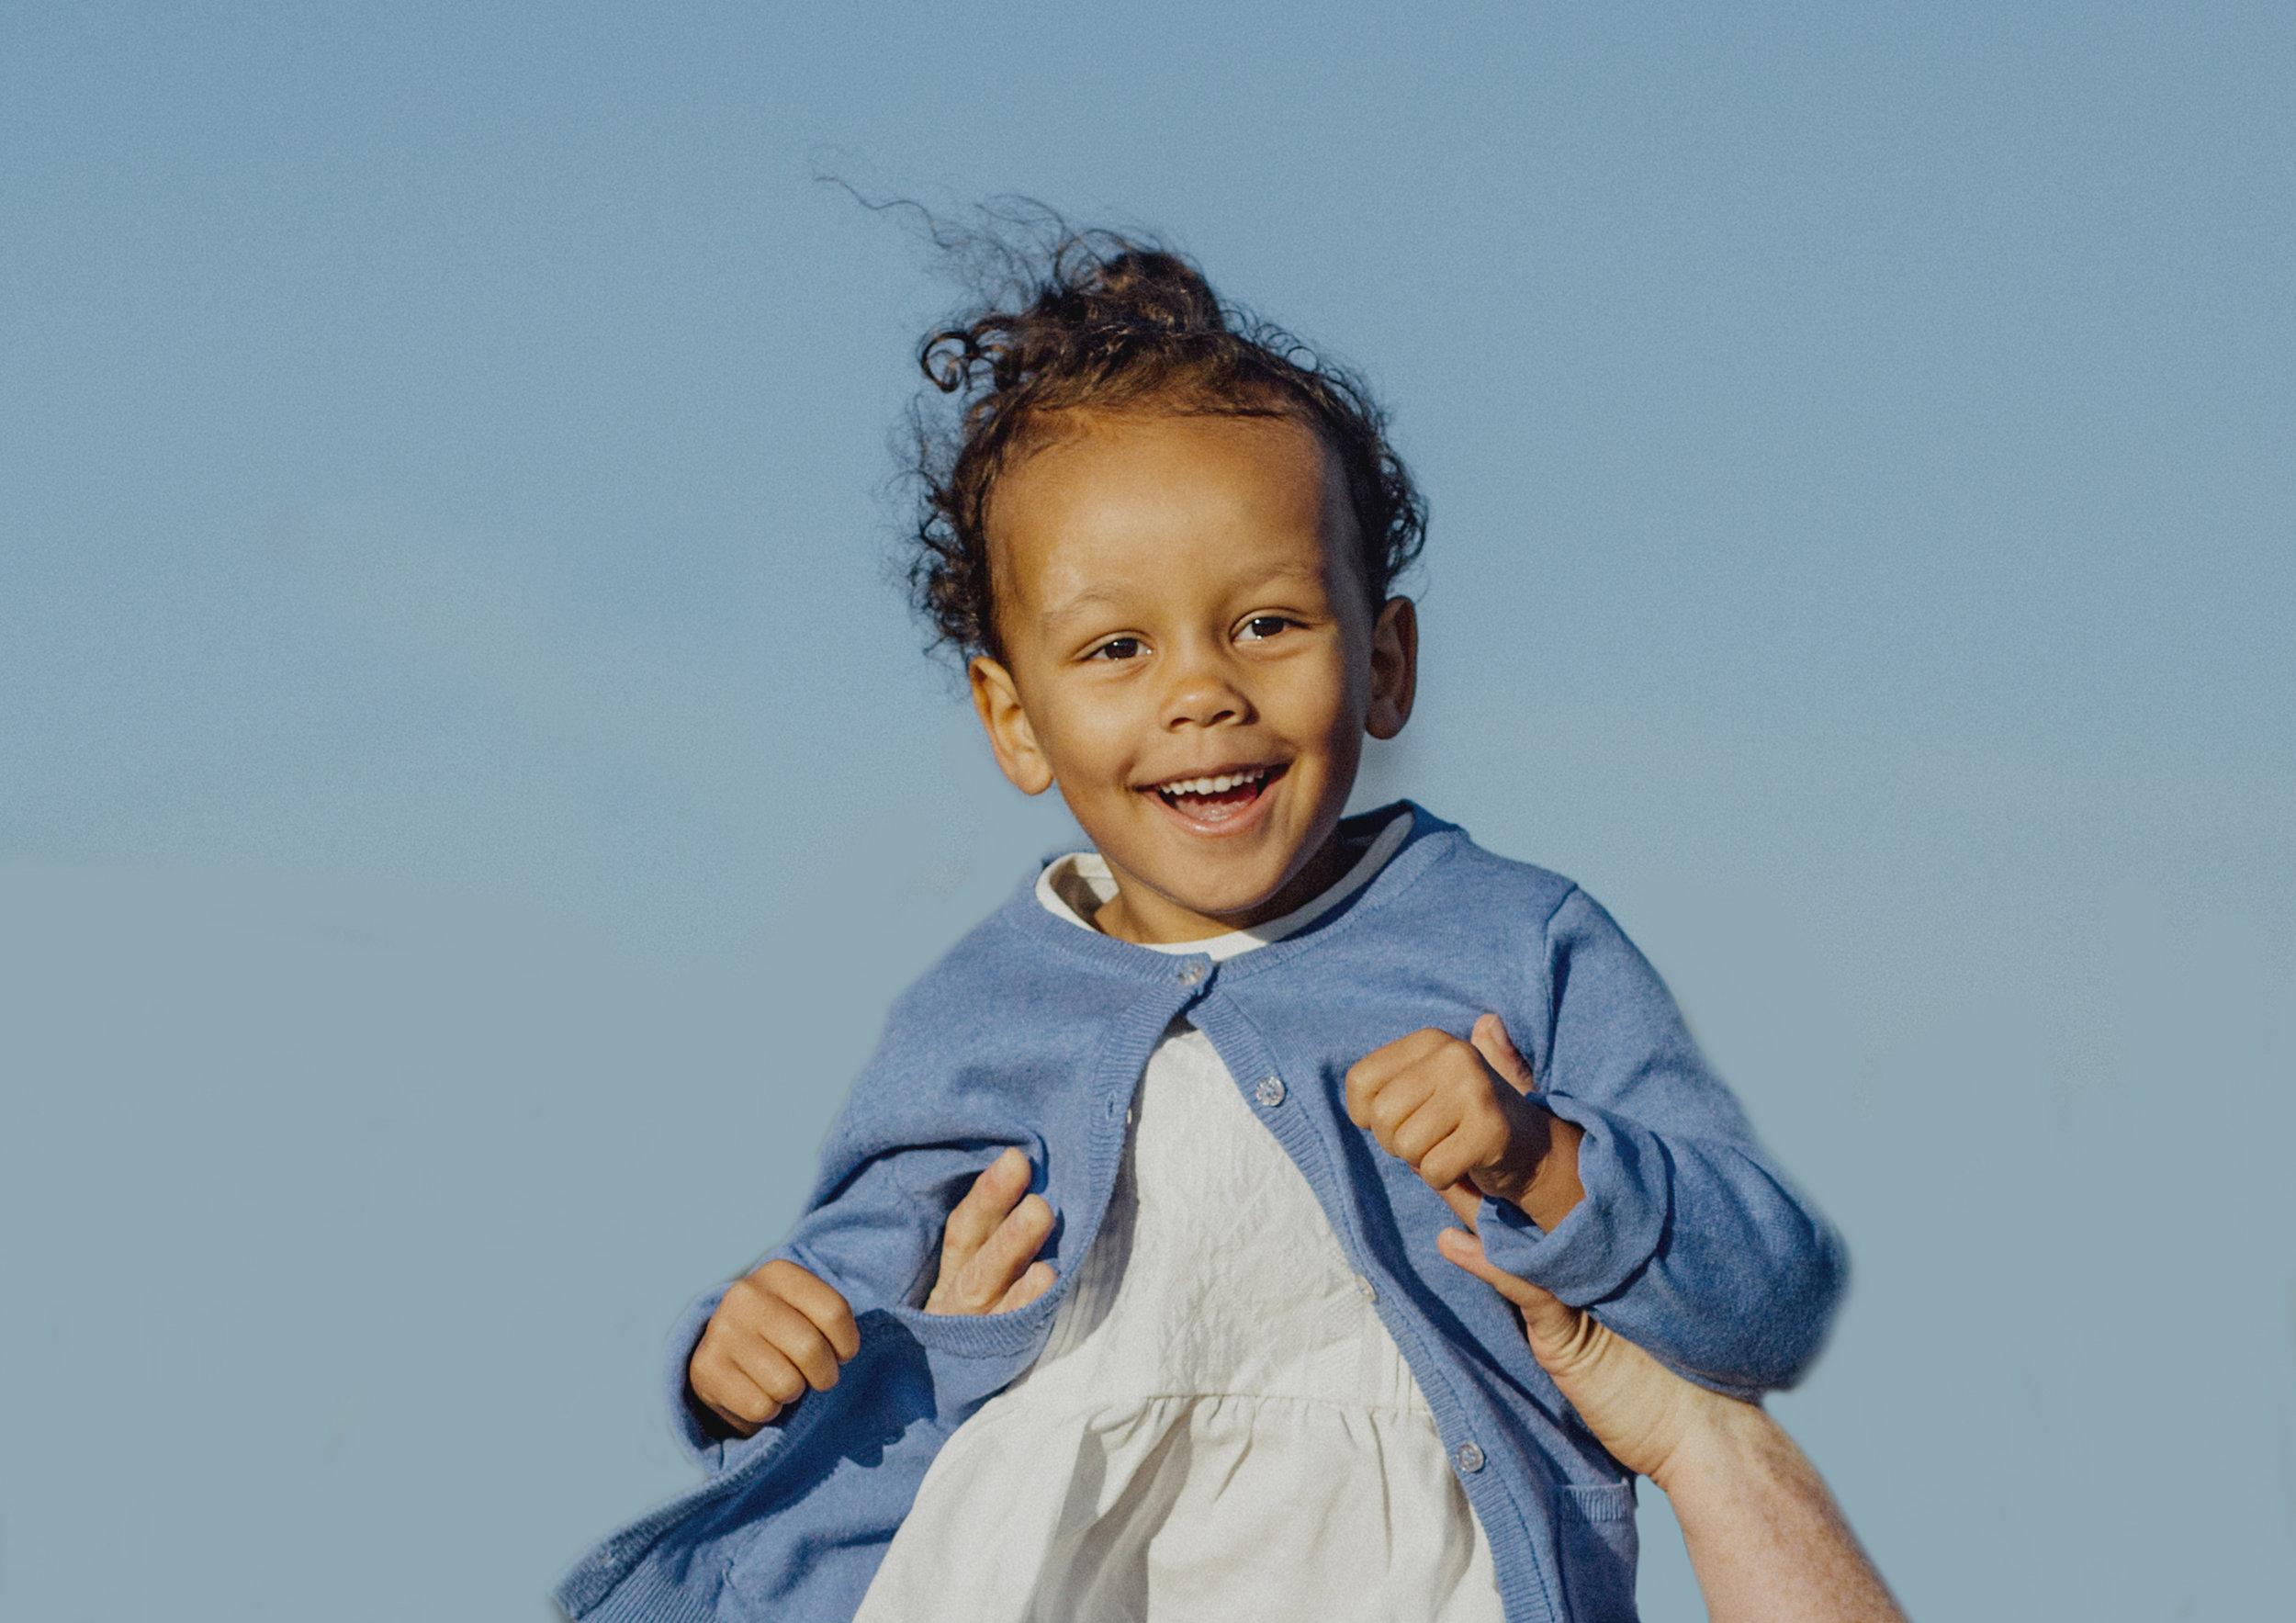 Melbourne Child Lifestyle Photography